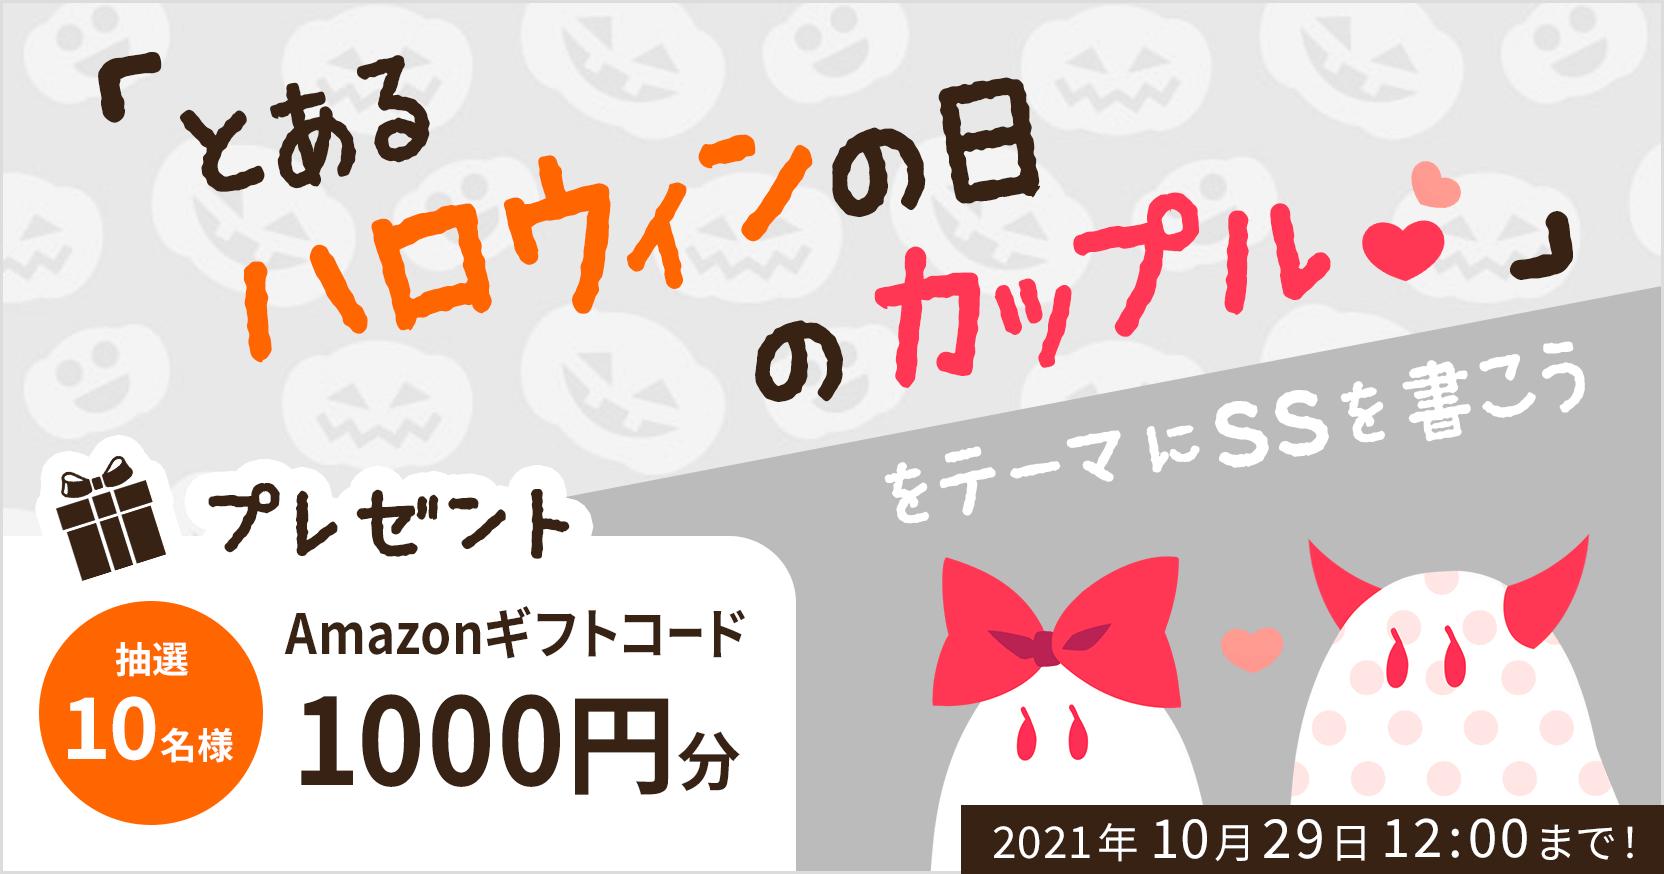 https://storage.googleapis.com/blog-info/entry/2021/10/211008-halloween_ogp.png